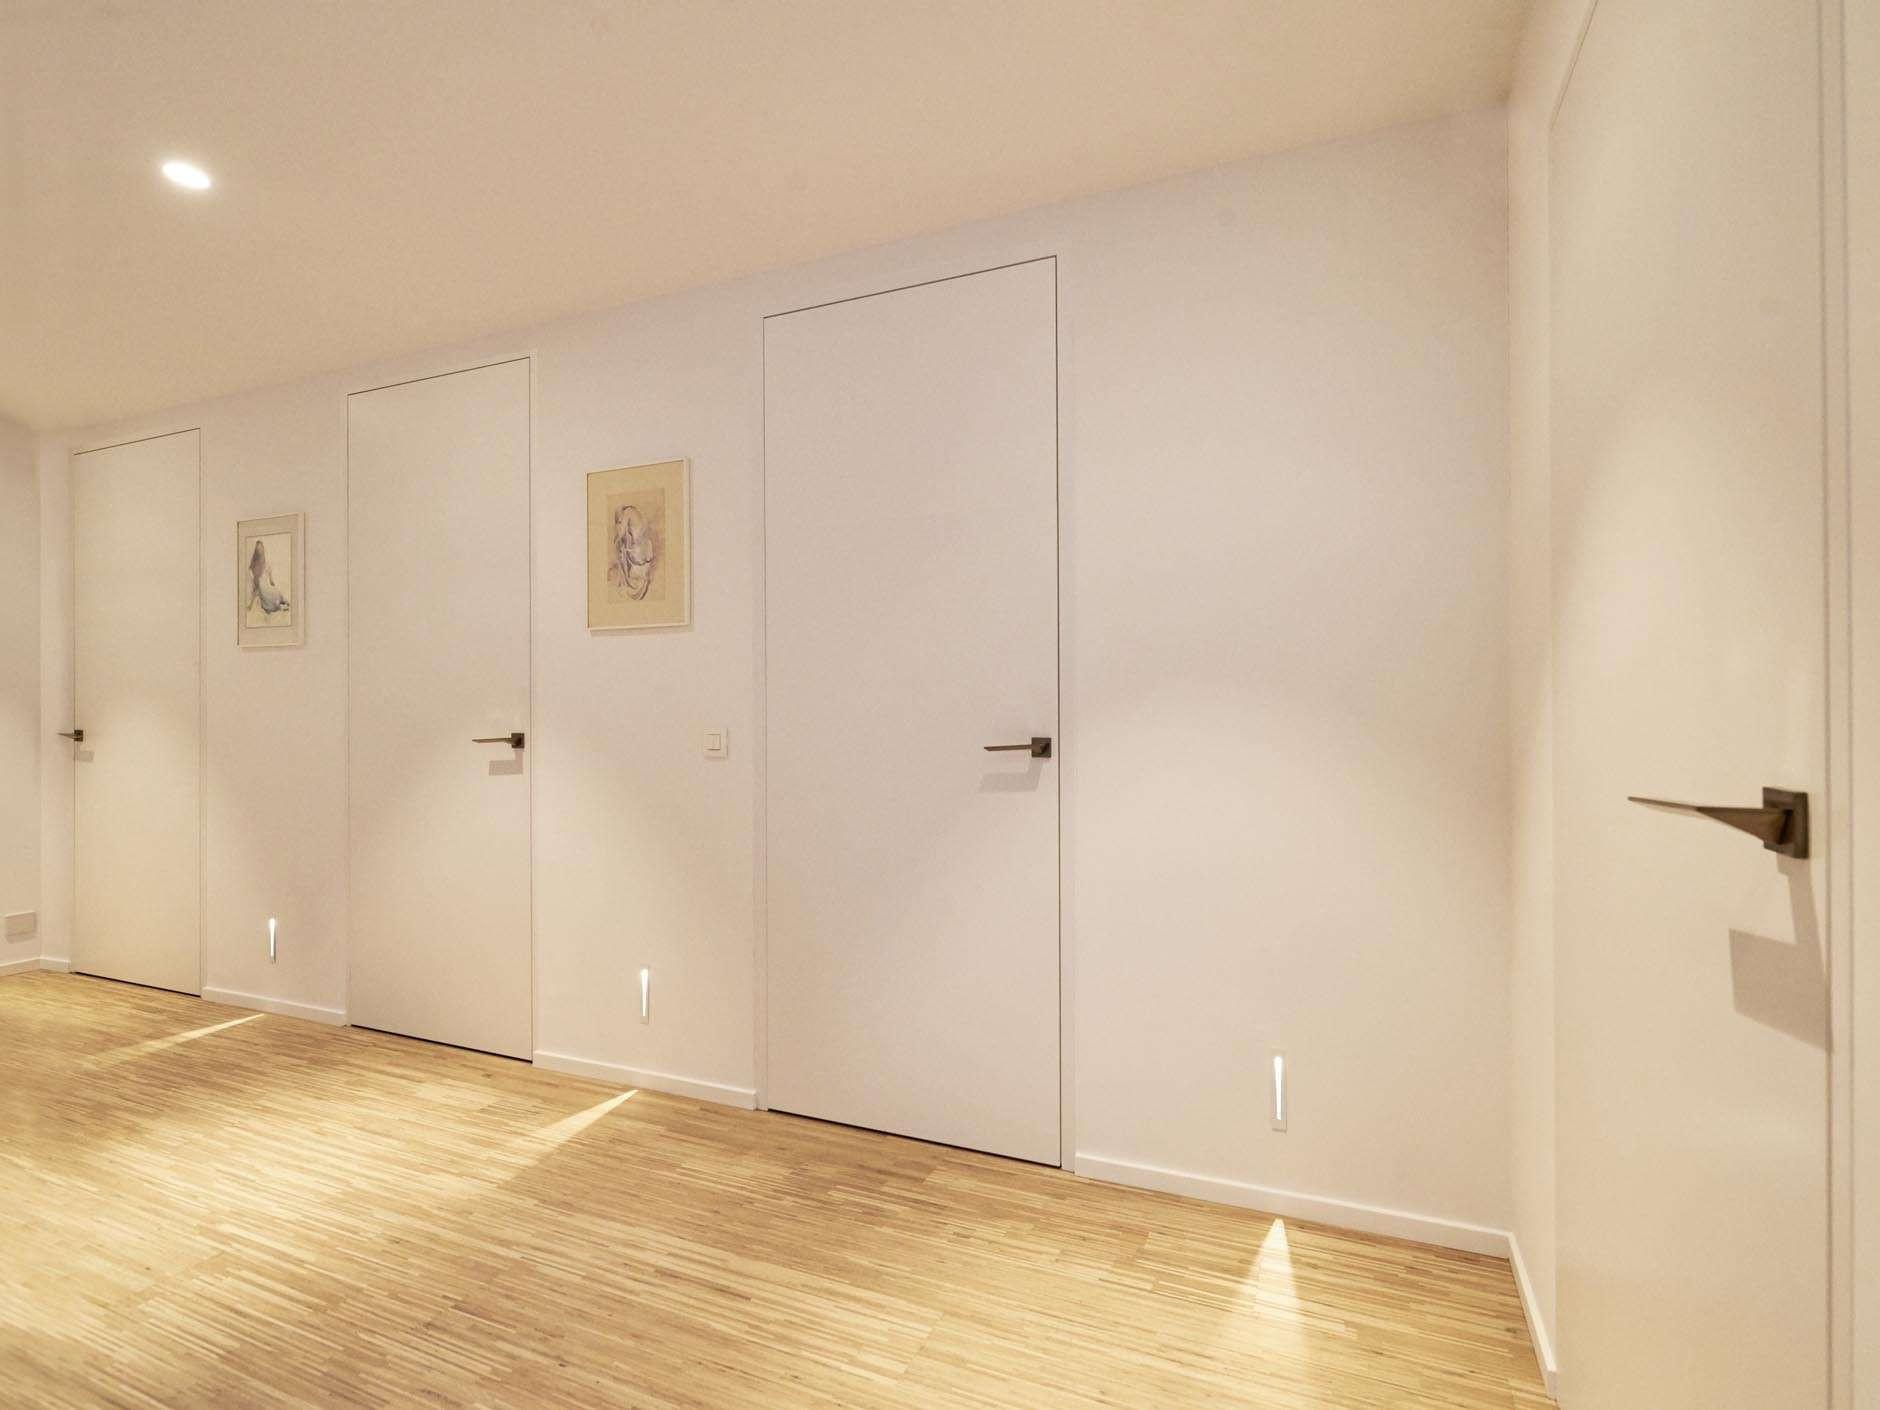 gangdeuren-strak-interieur